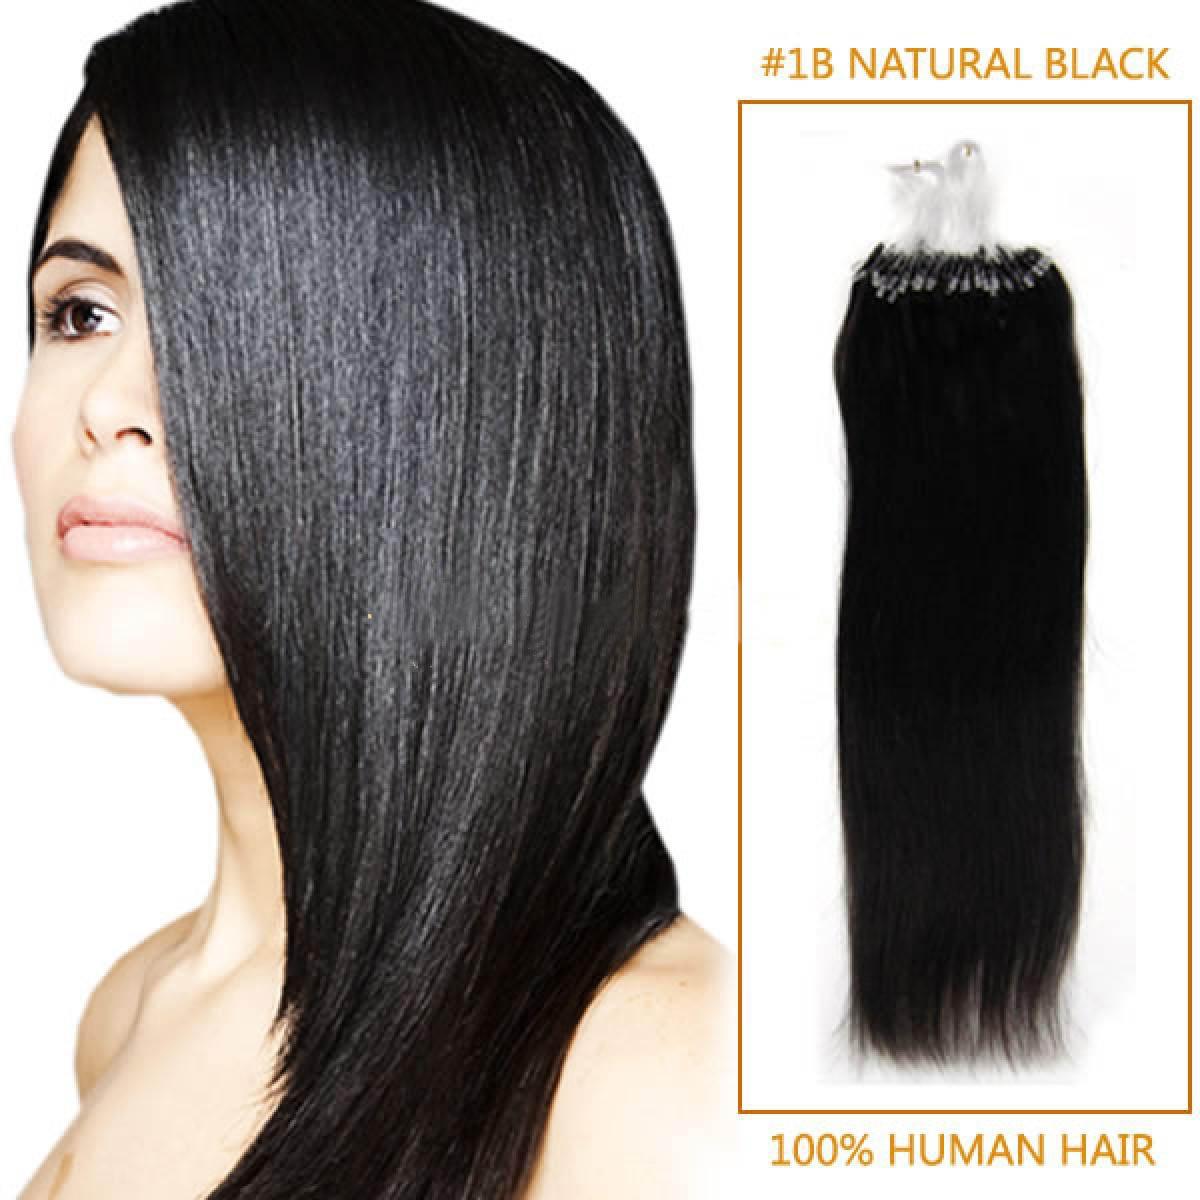 18 Inch #1b Natural Black Micro Loop Human Hair Extensions 100S